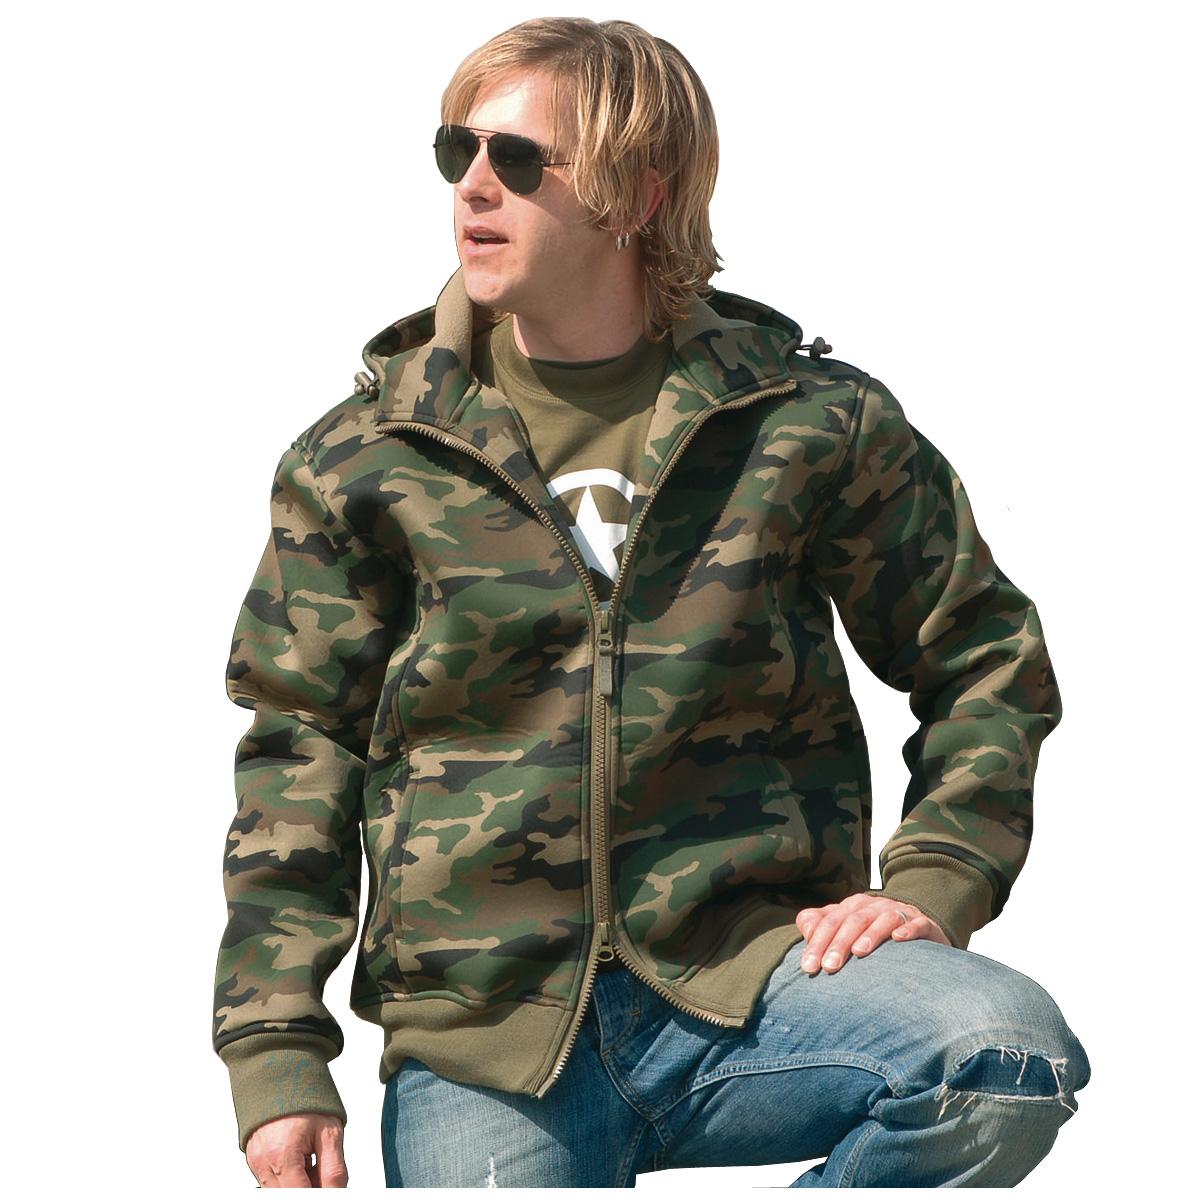 Army Windproof Neoprene Mens Thermal Jacket Hooded Fleece